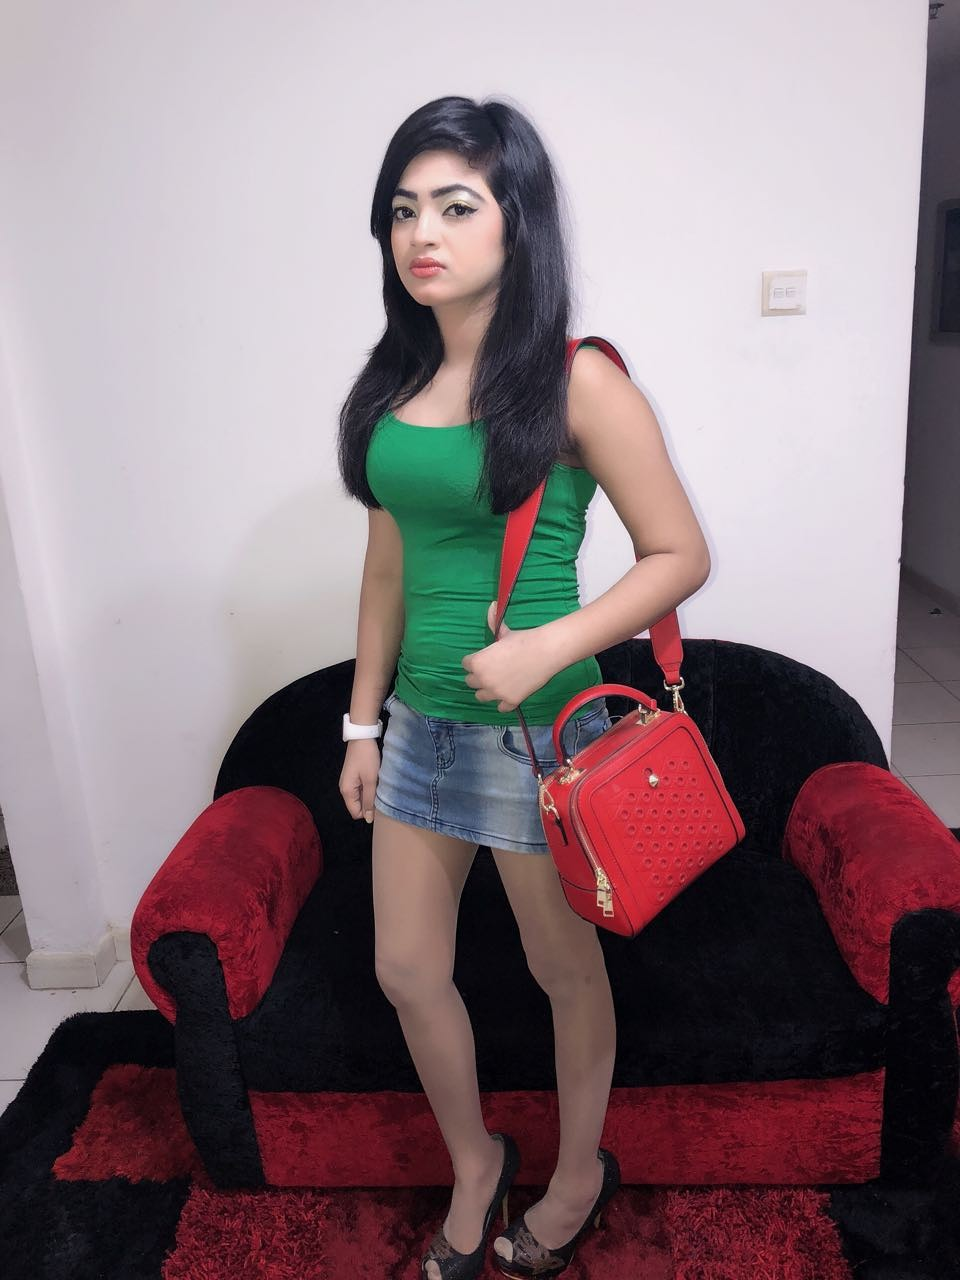 Escorts in Kuala Lumpur Girls Dating